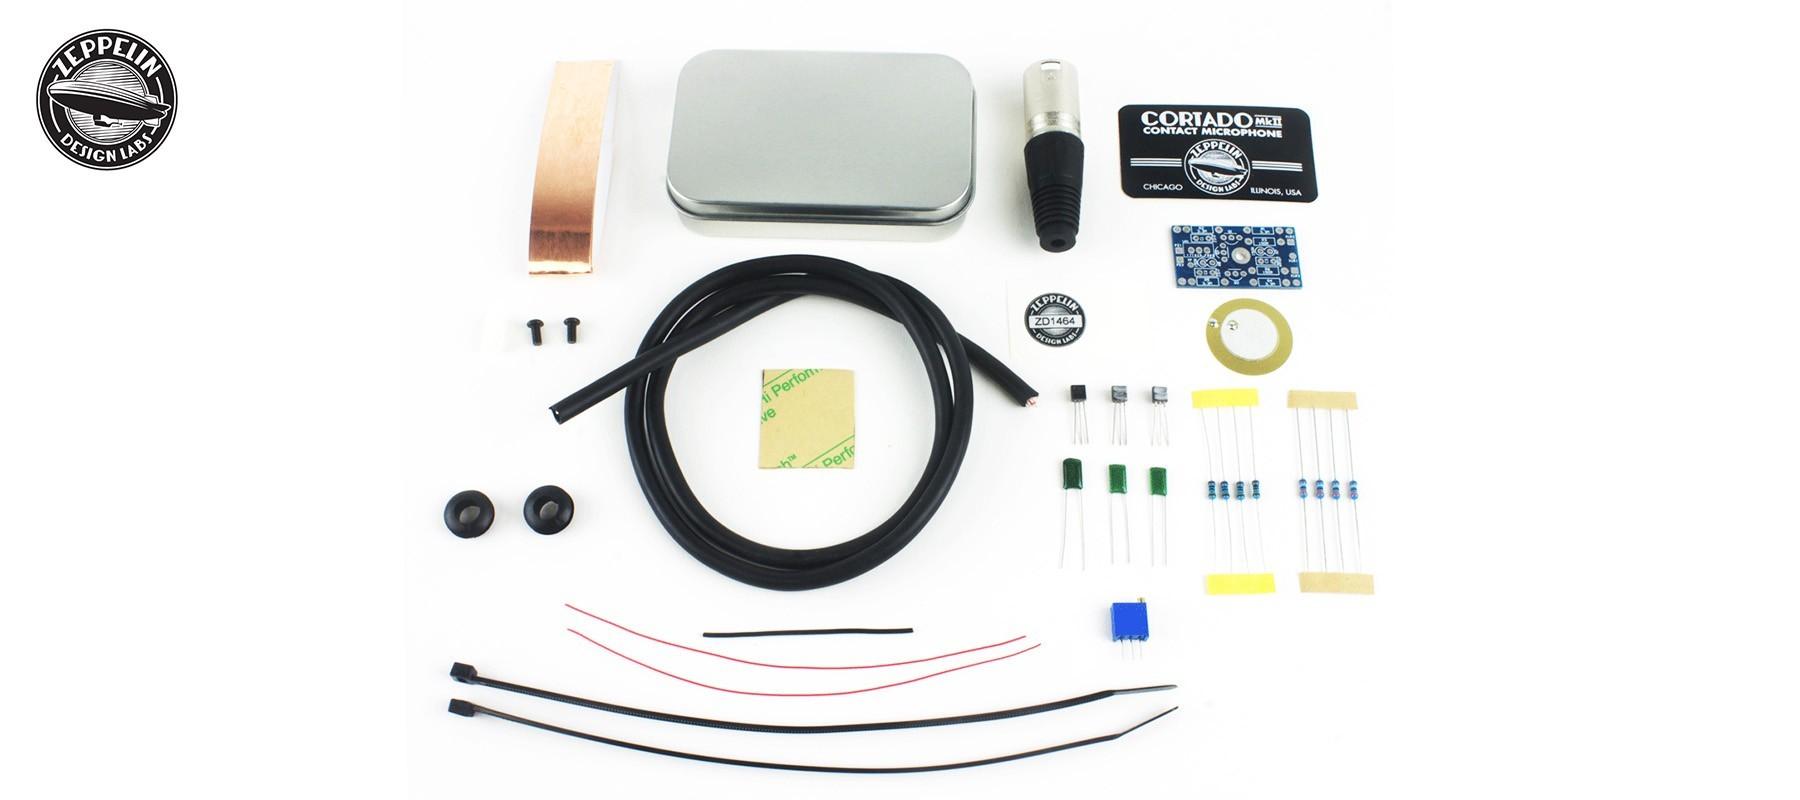 Cortado MkII Balanced Buffered Contact Mic DIY Kit